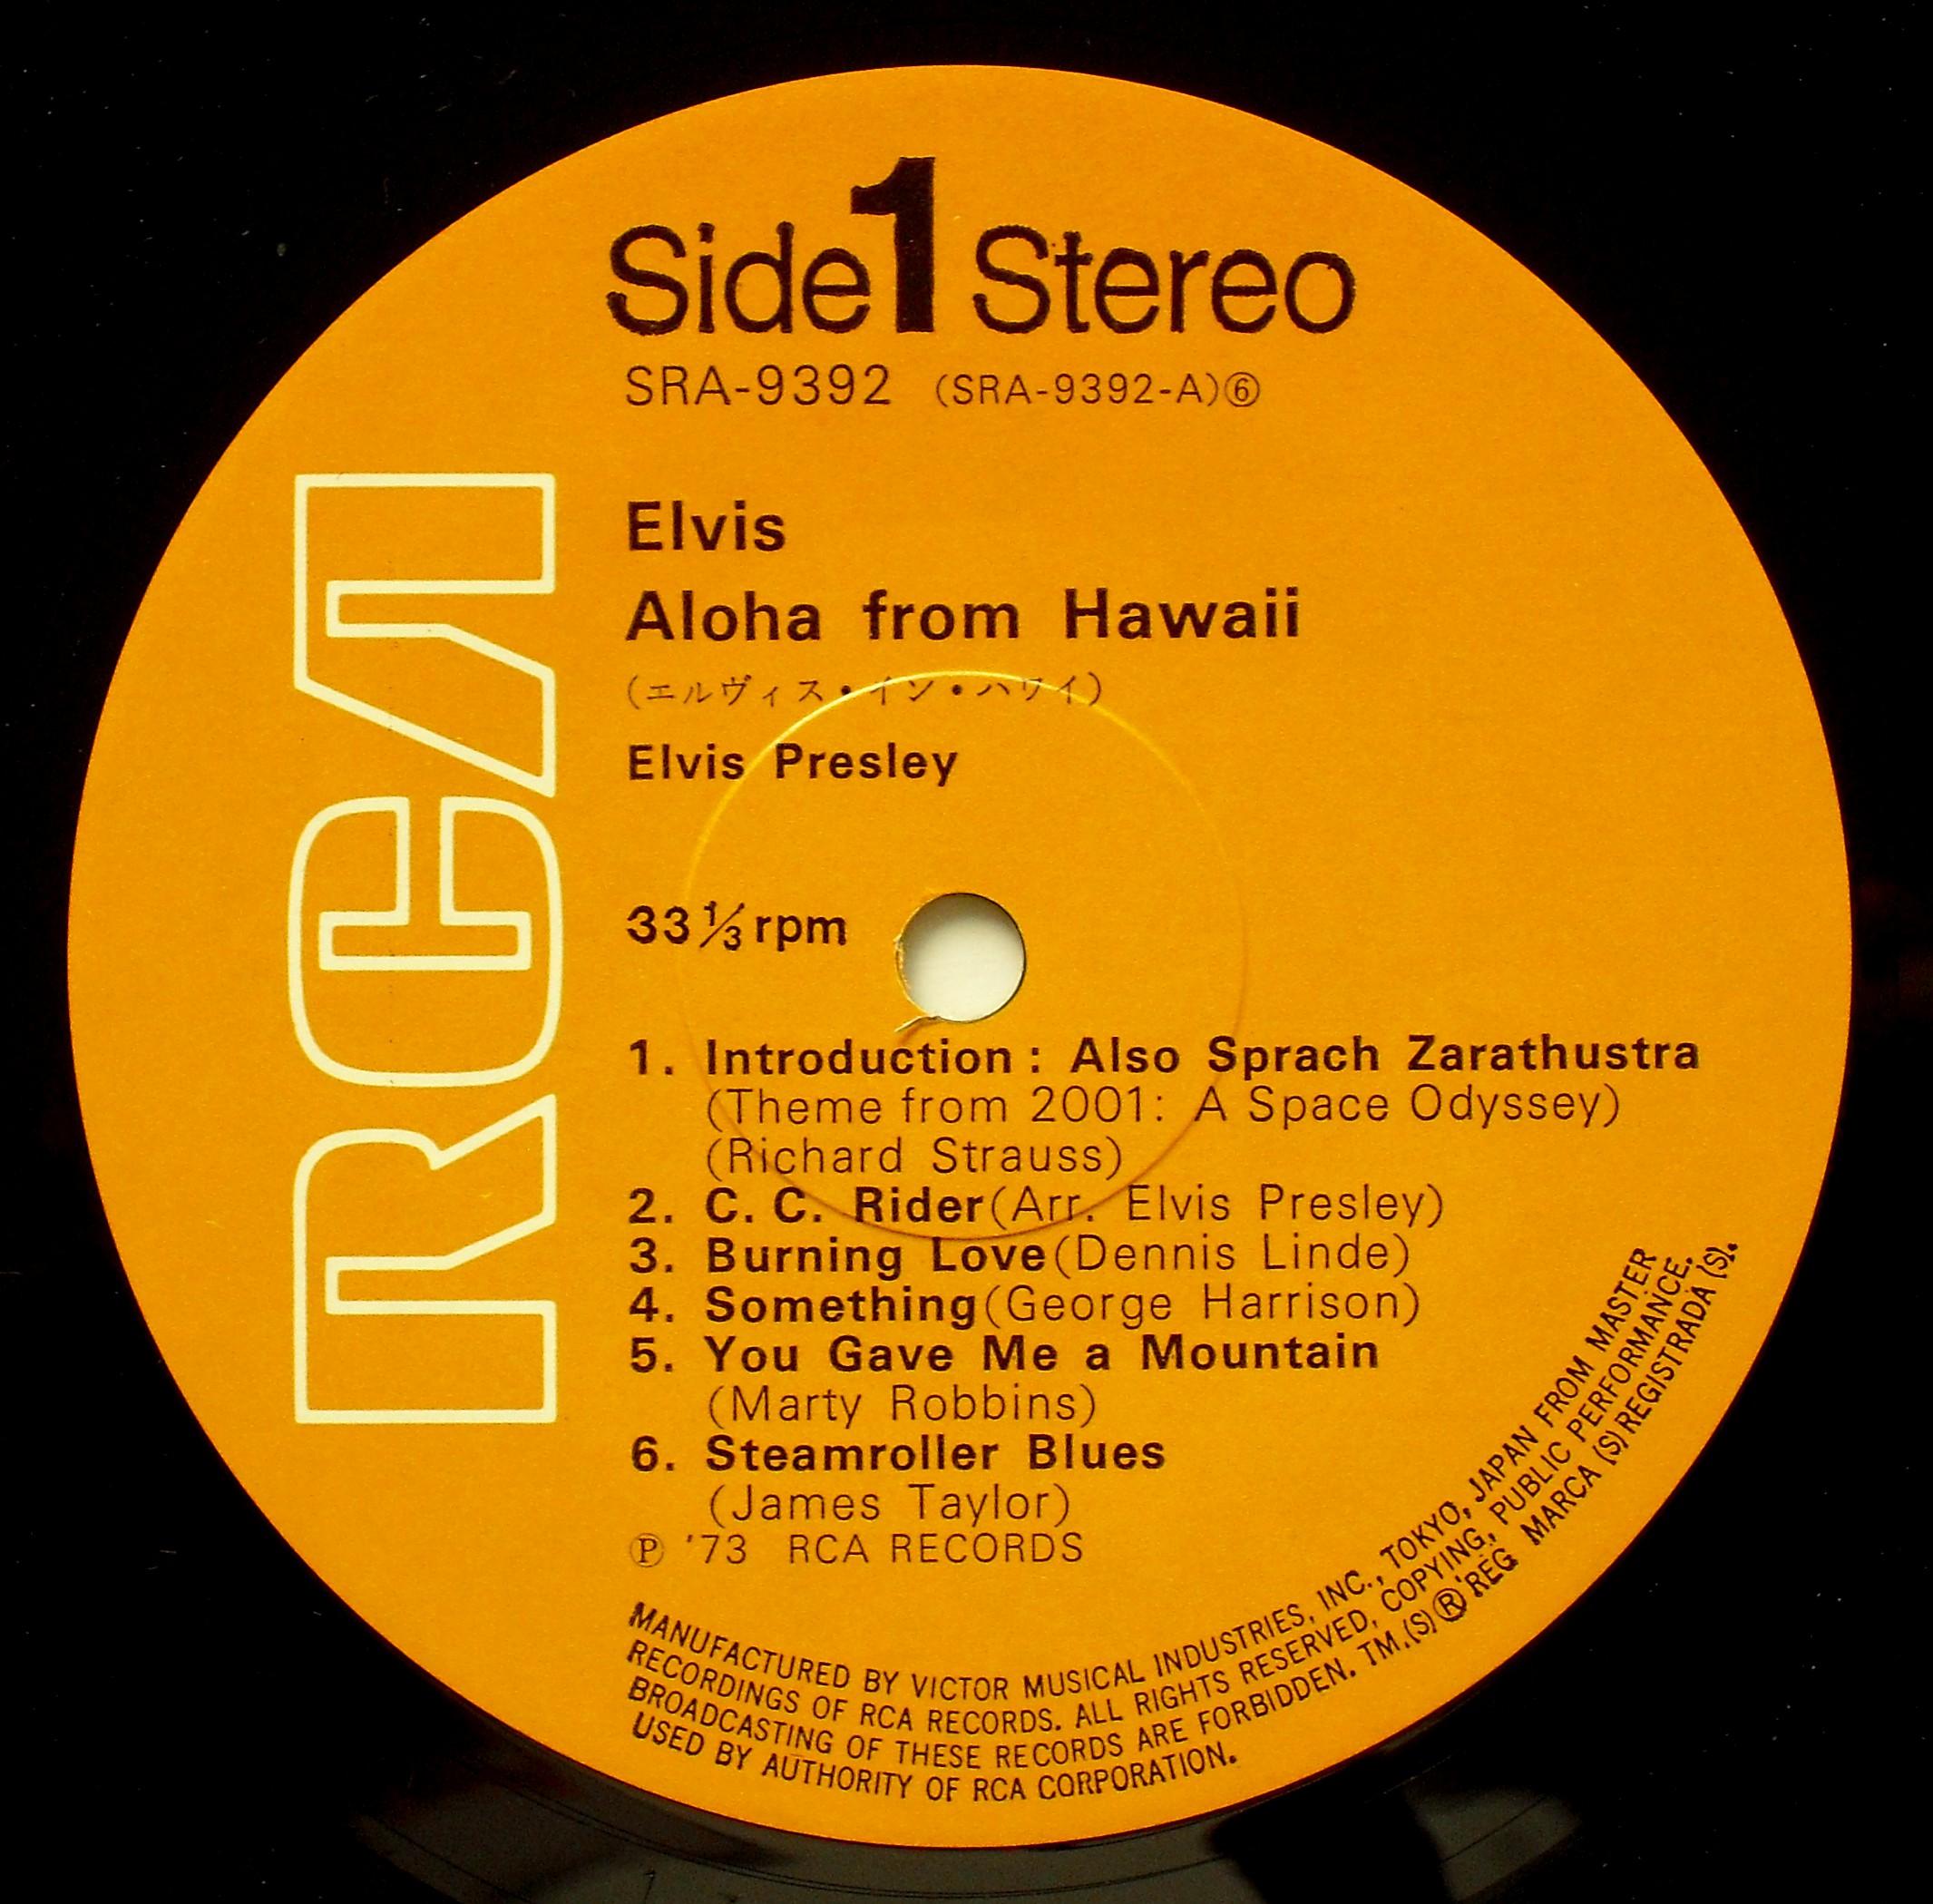 ALOHA FROM HAWAII VIA SATELLITE 04s13uog4